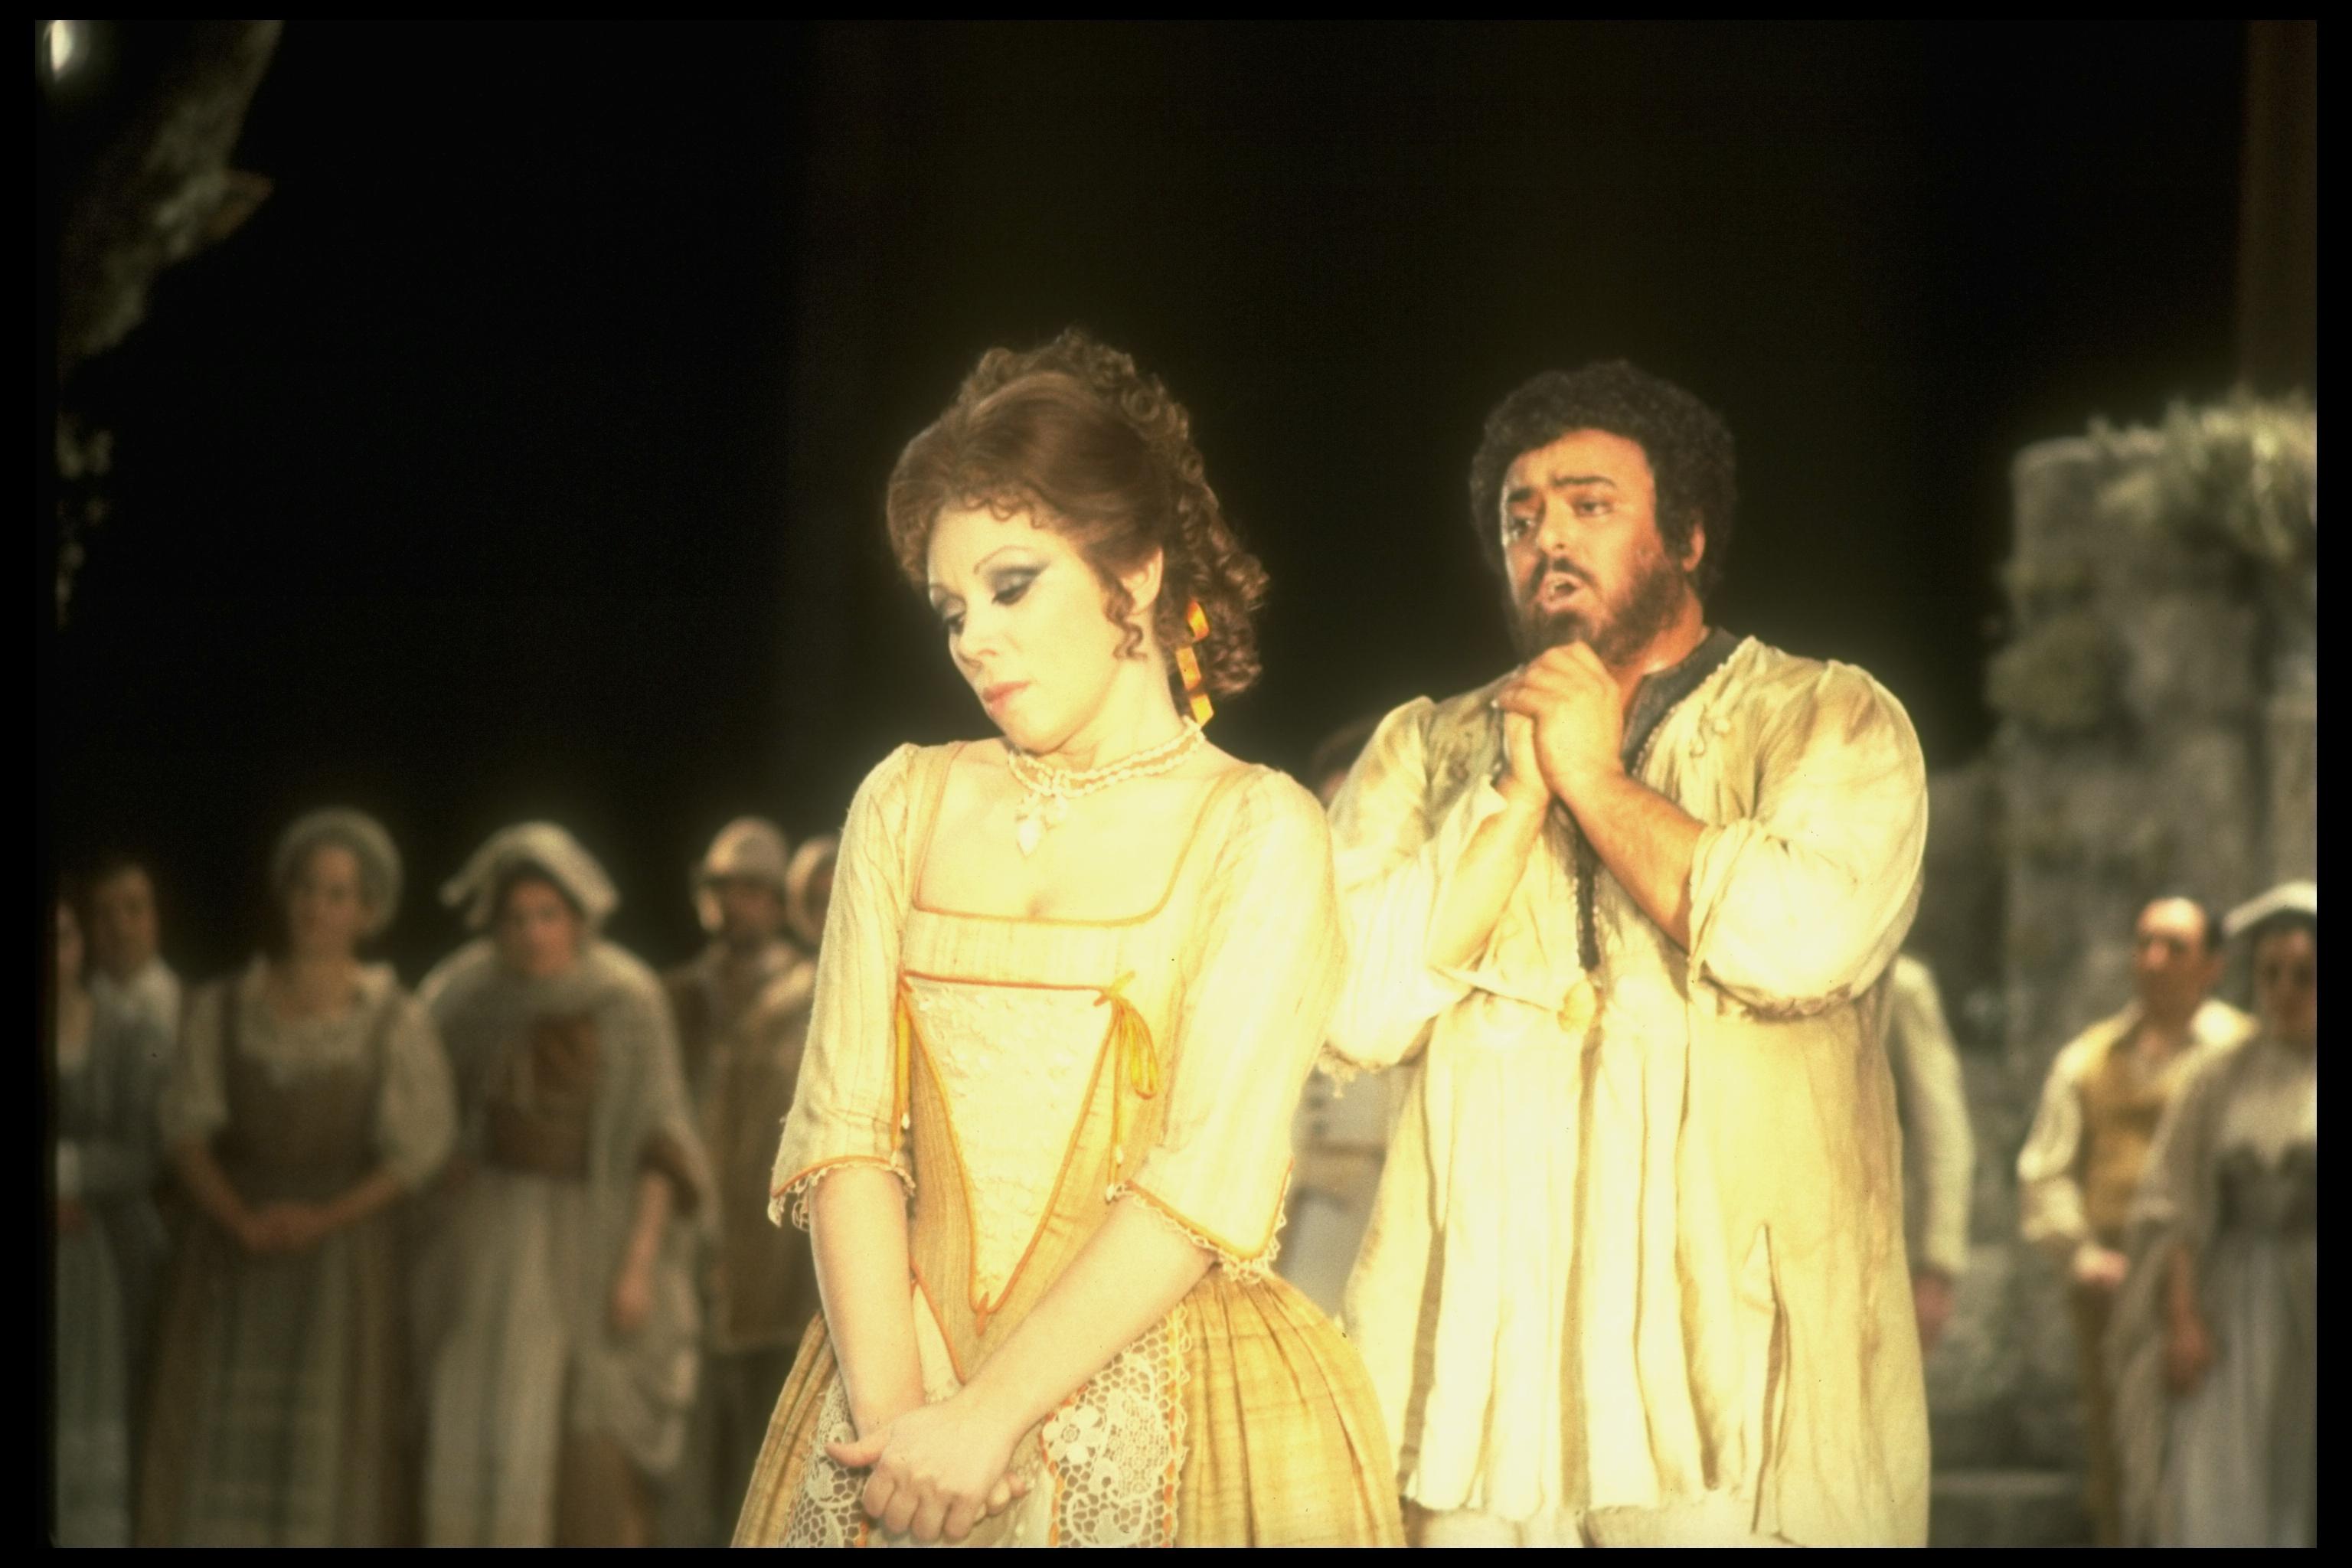 Mirella Freni performing with Pavarotti in opera L